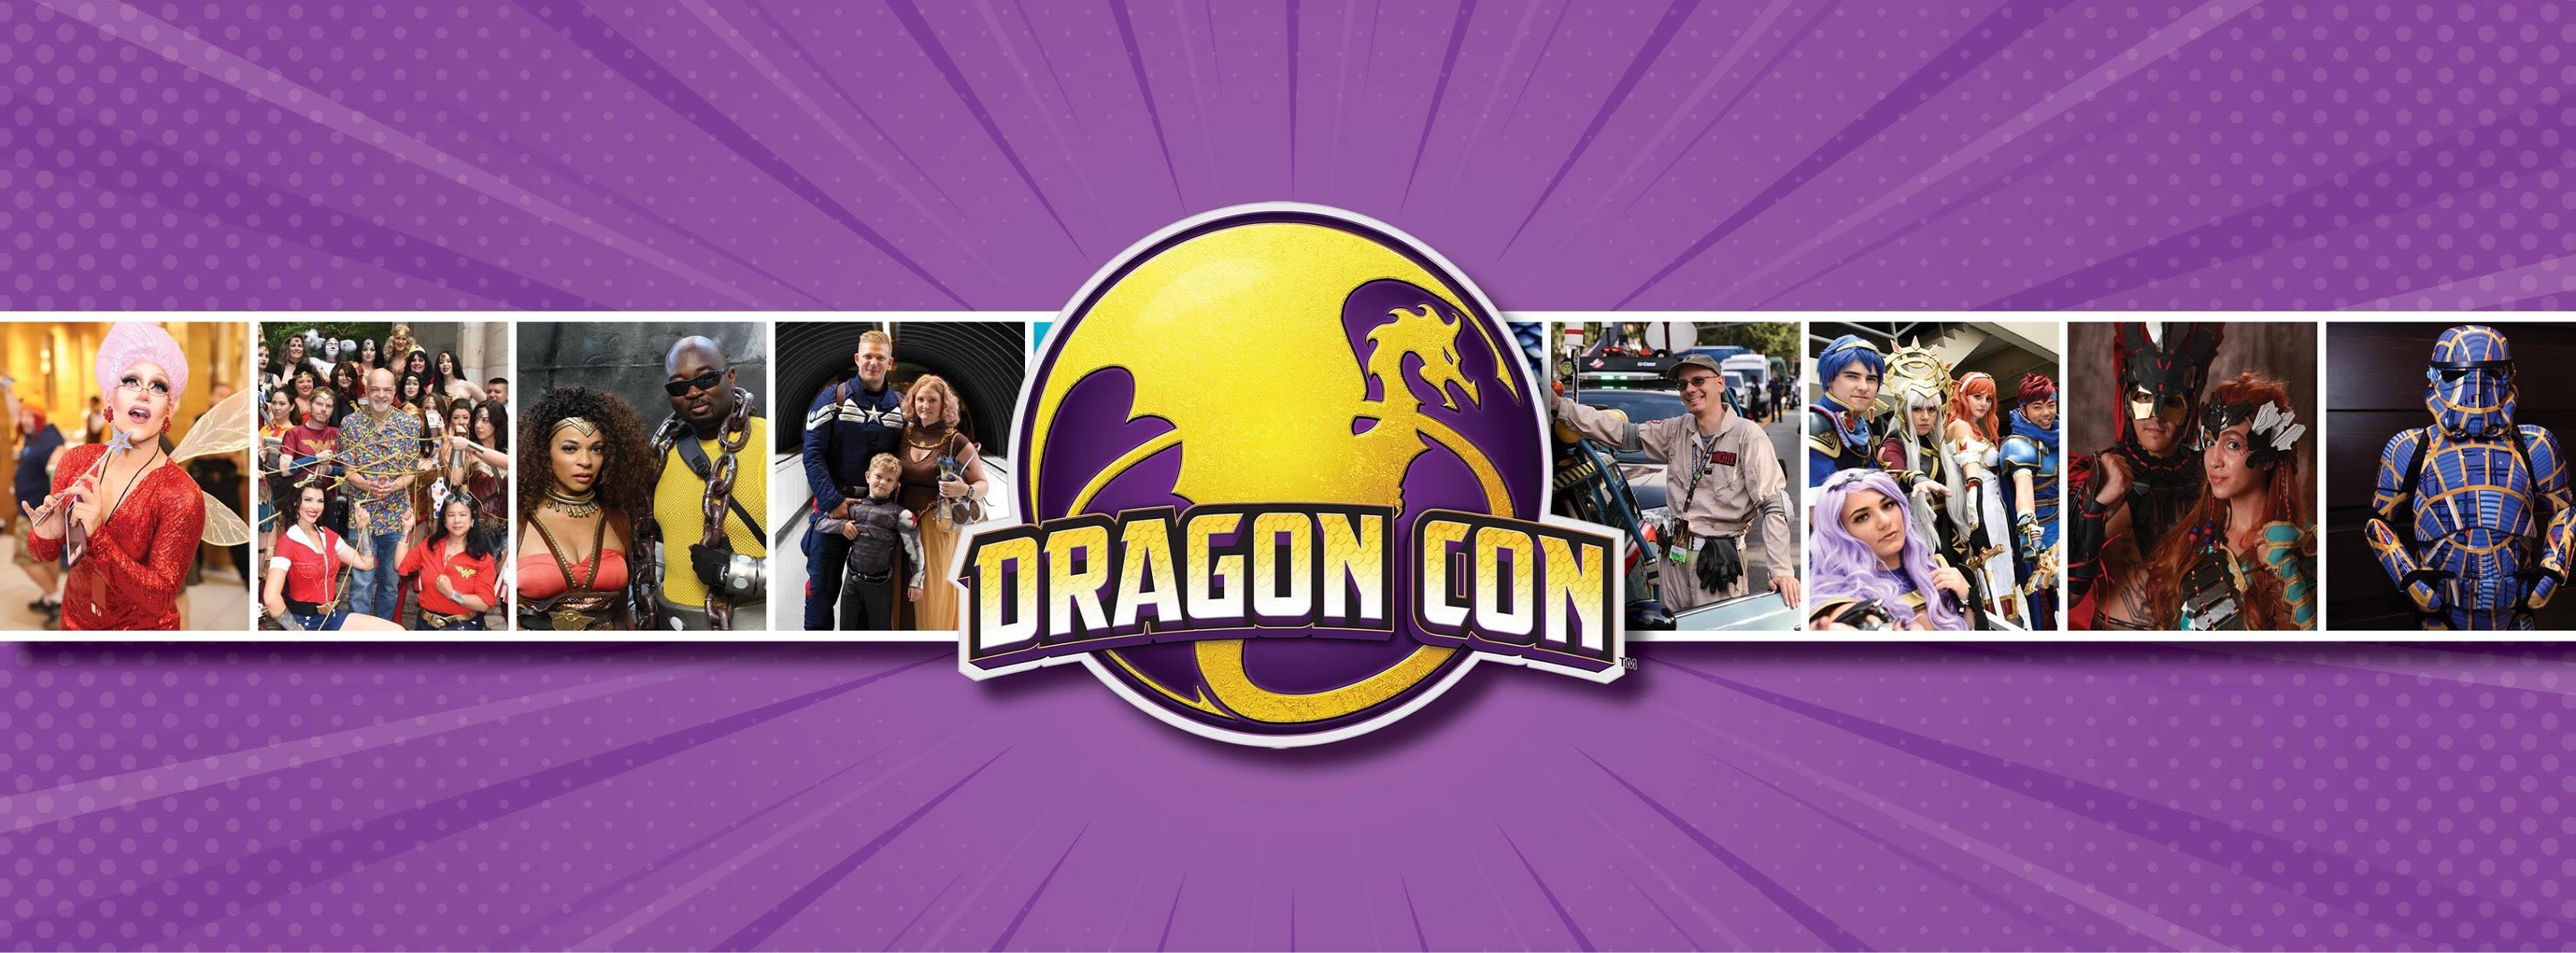 DragonCon banner